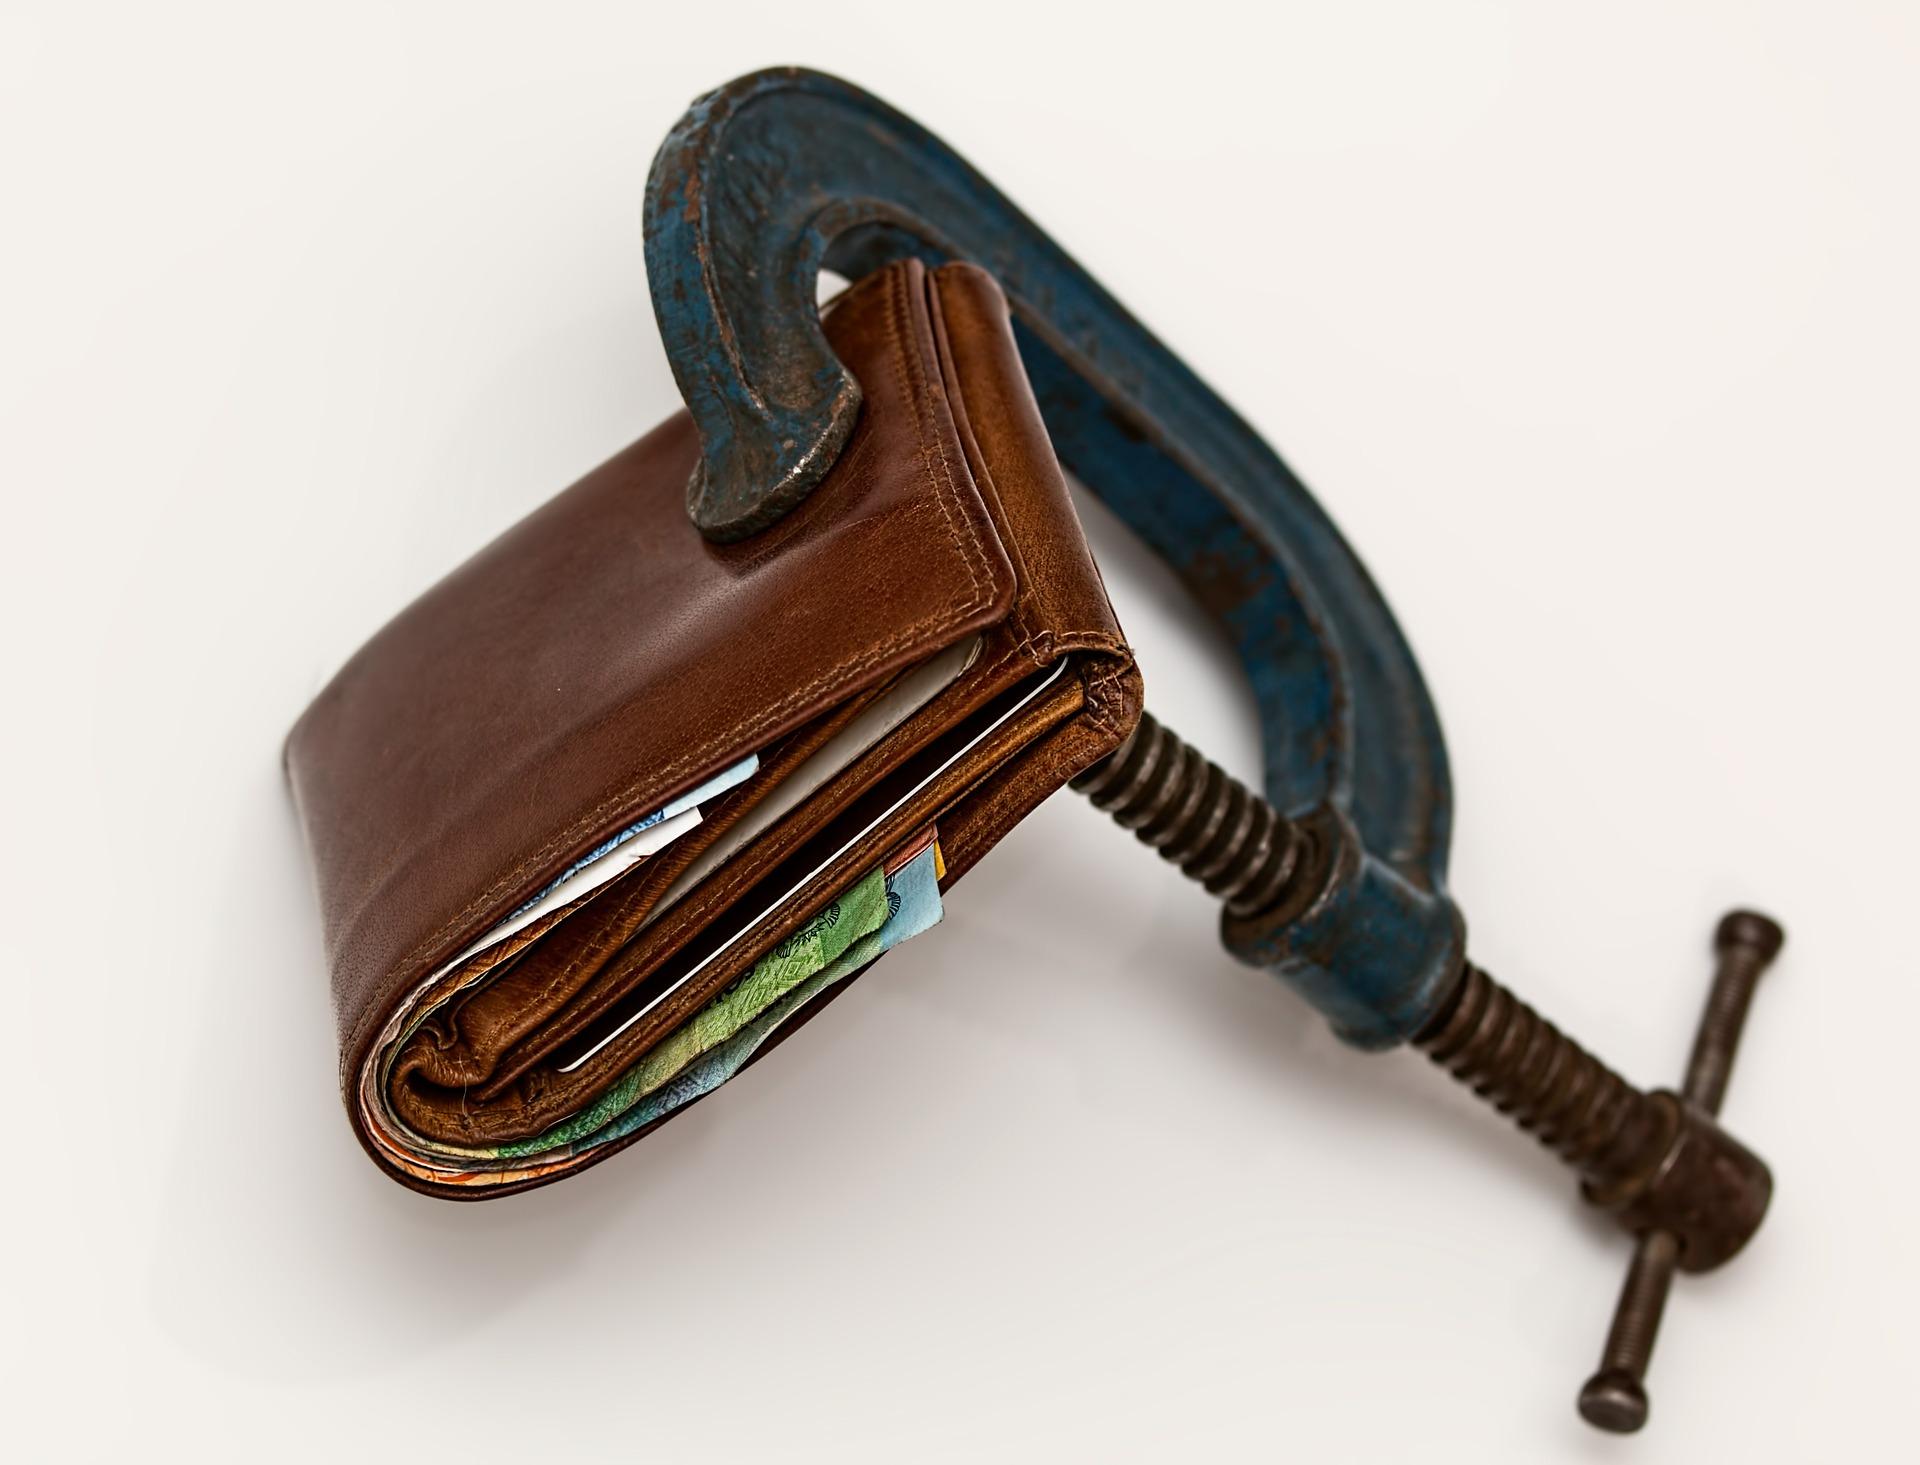 Wallet squeeze image: